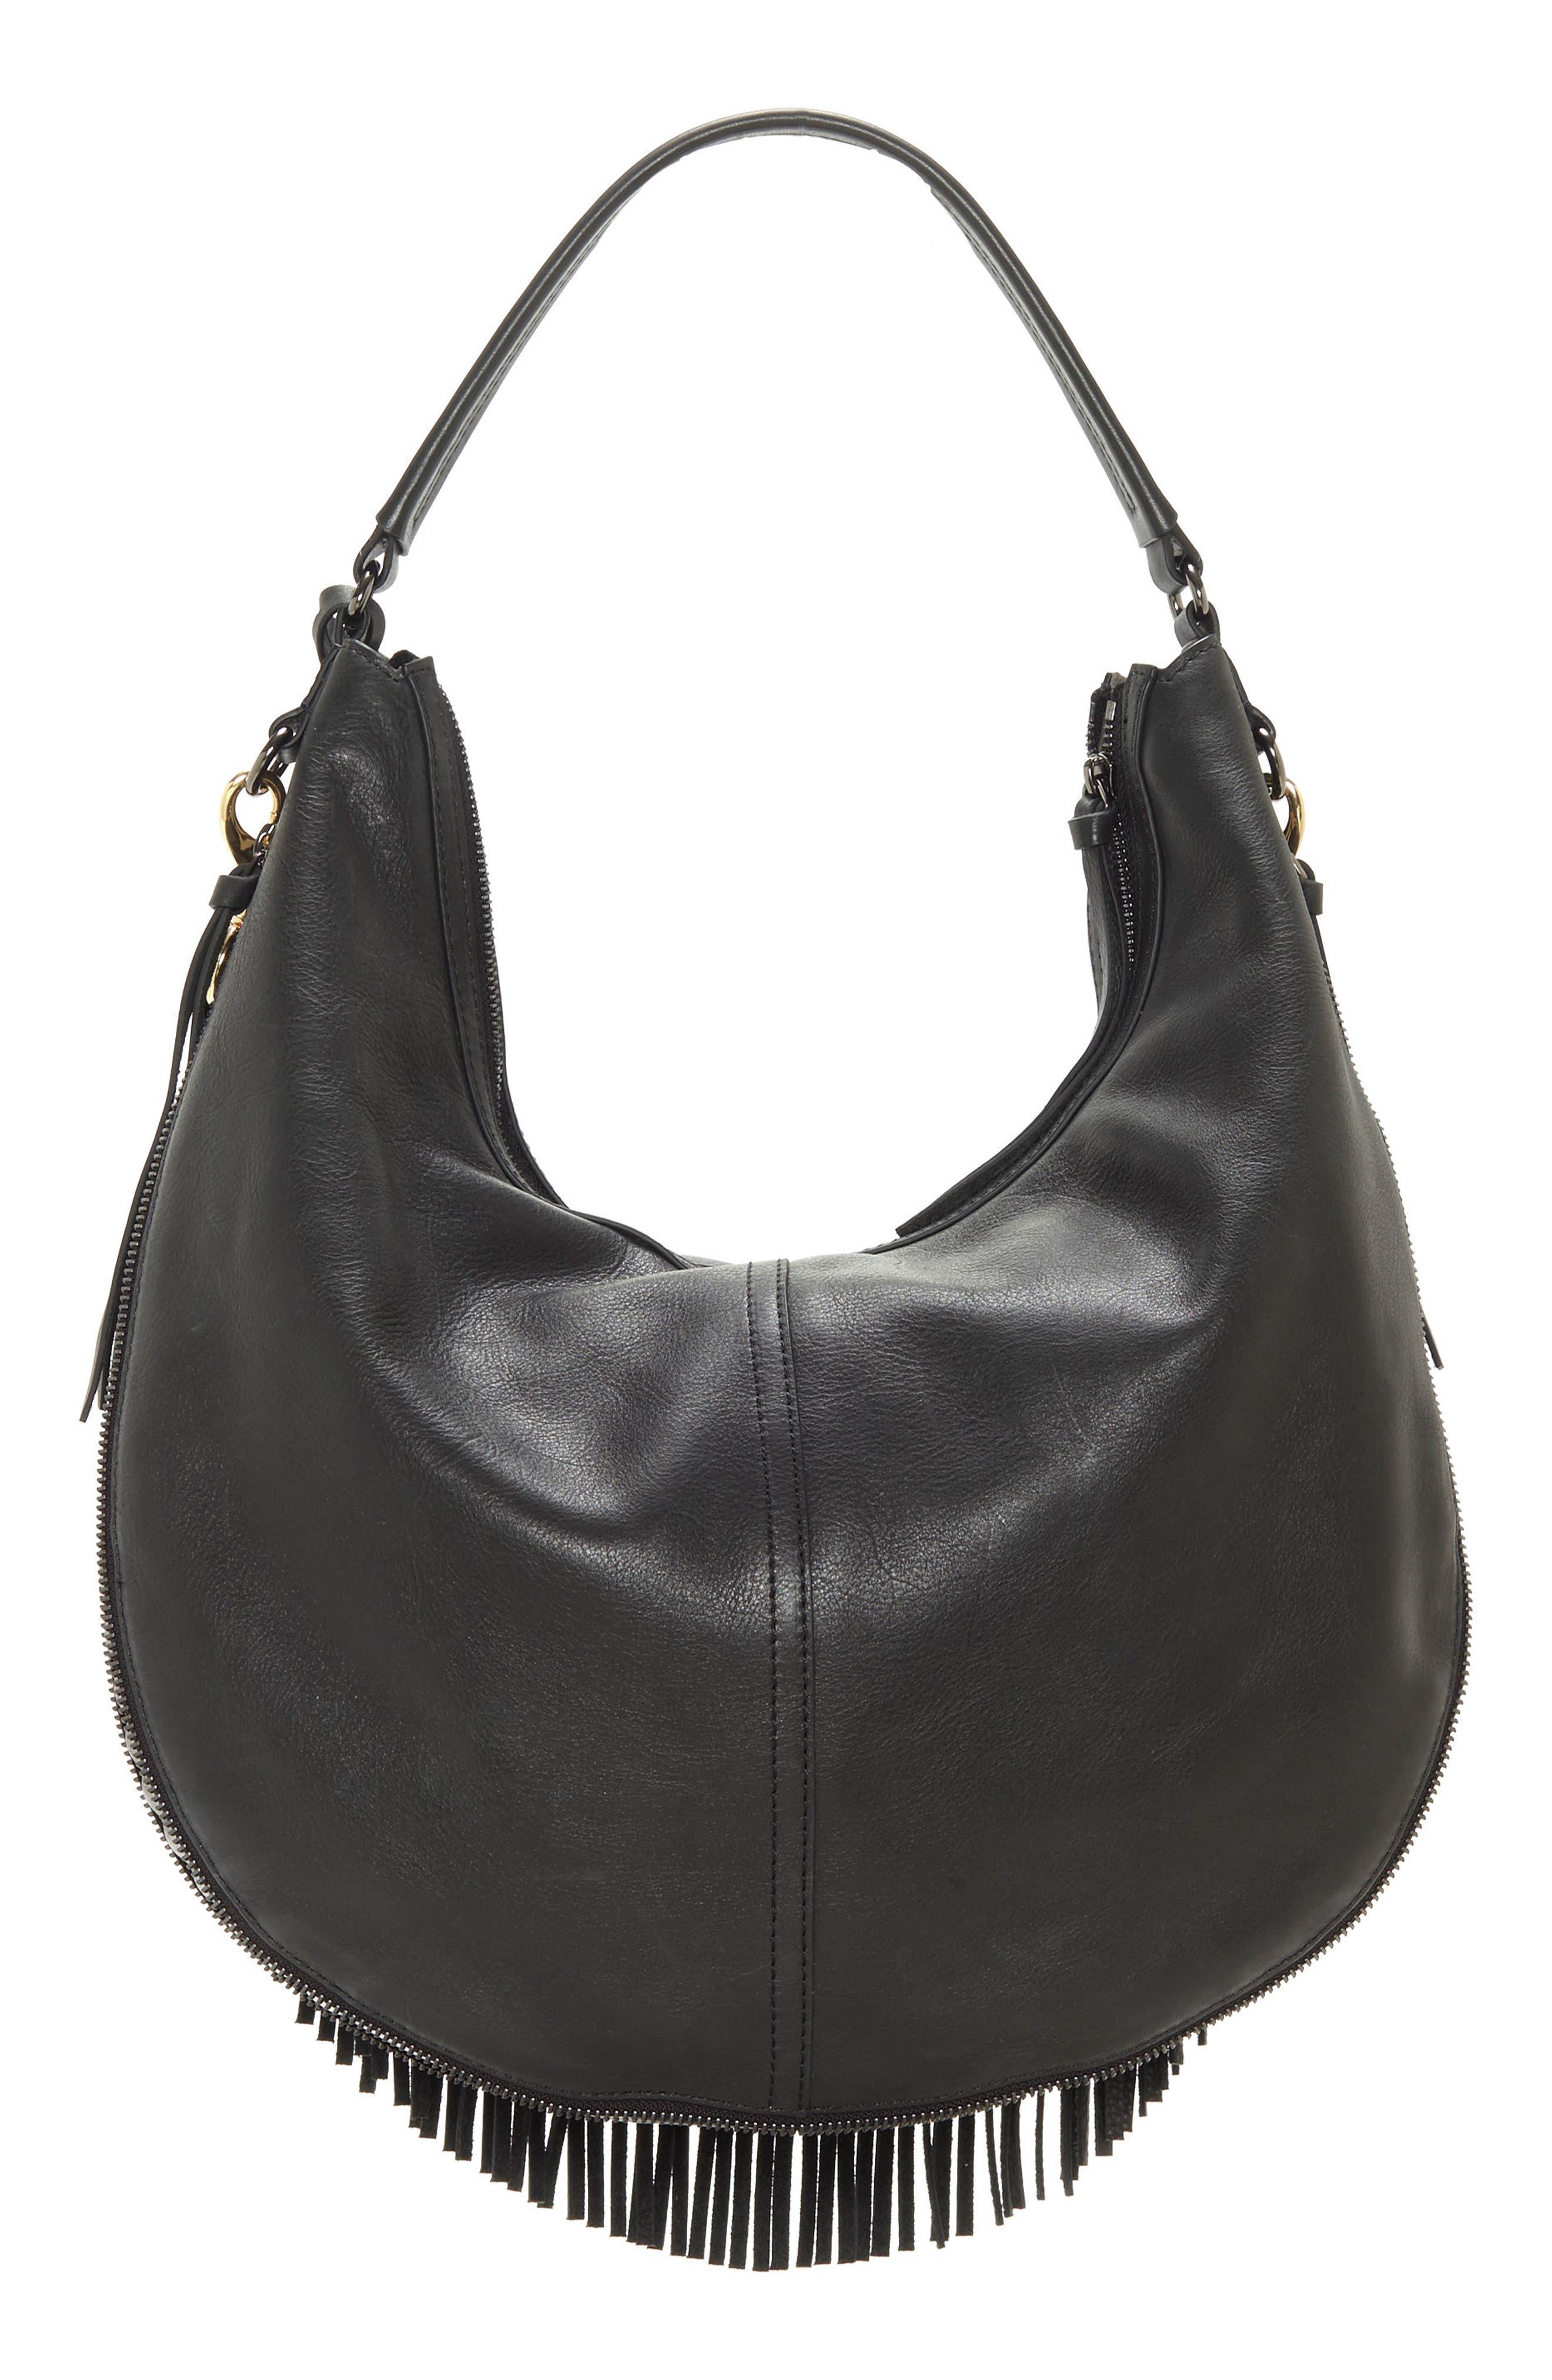 Hil Leather Hobo Bag,                             Alternate thumbnail 2, color,                             002